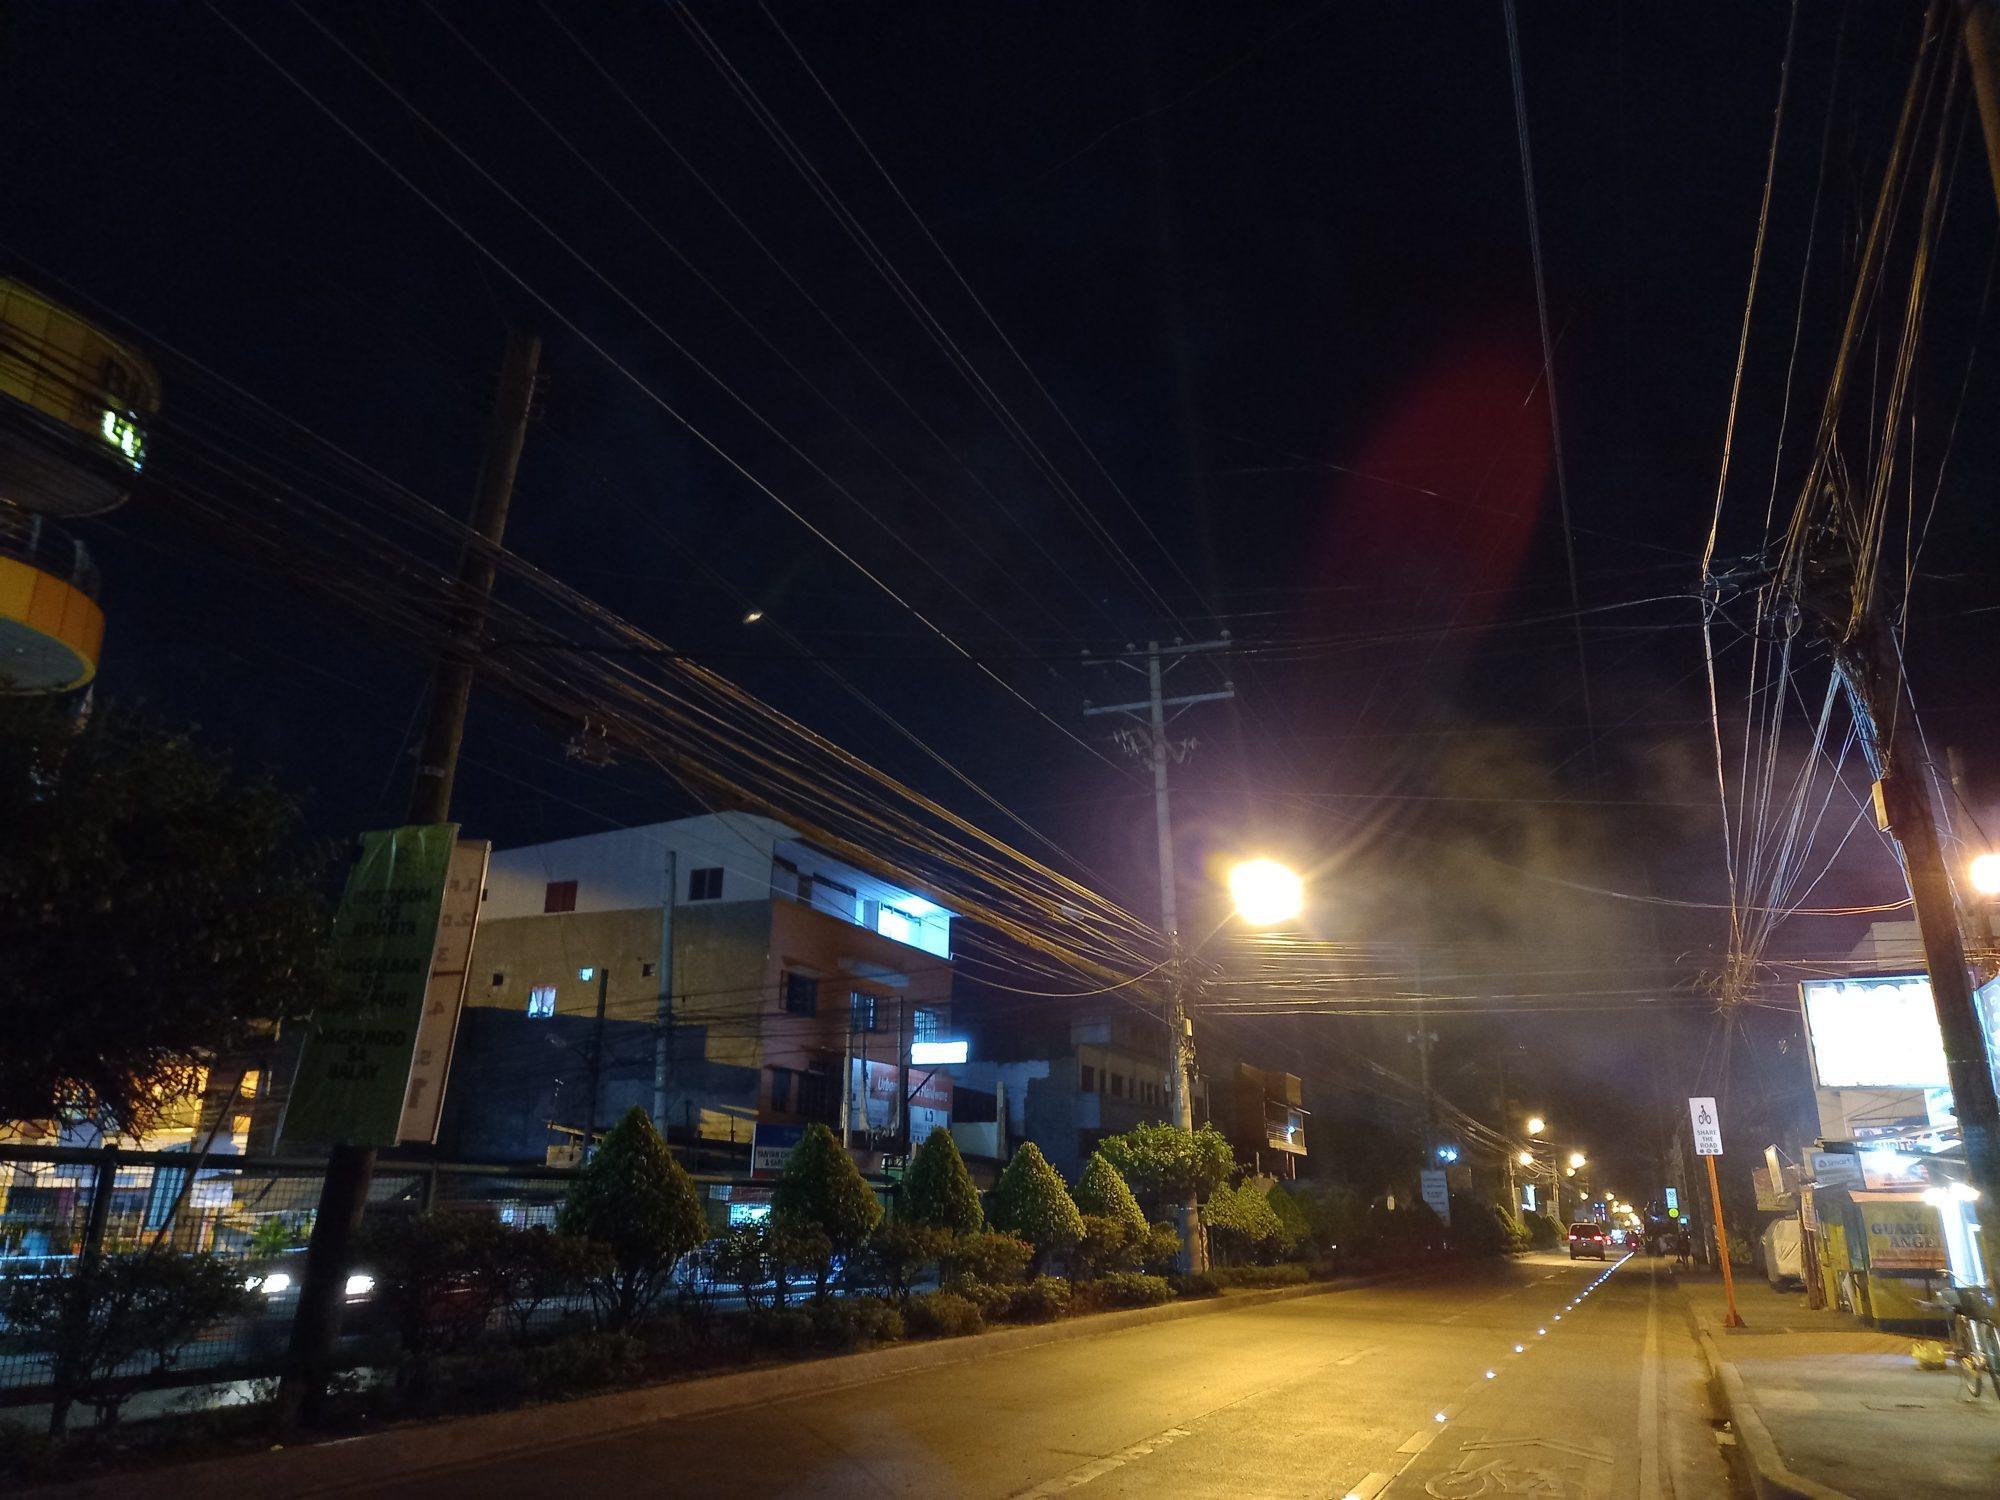 Night shot on Pro mode